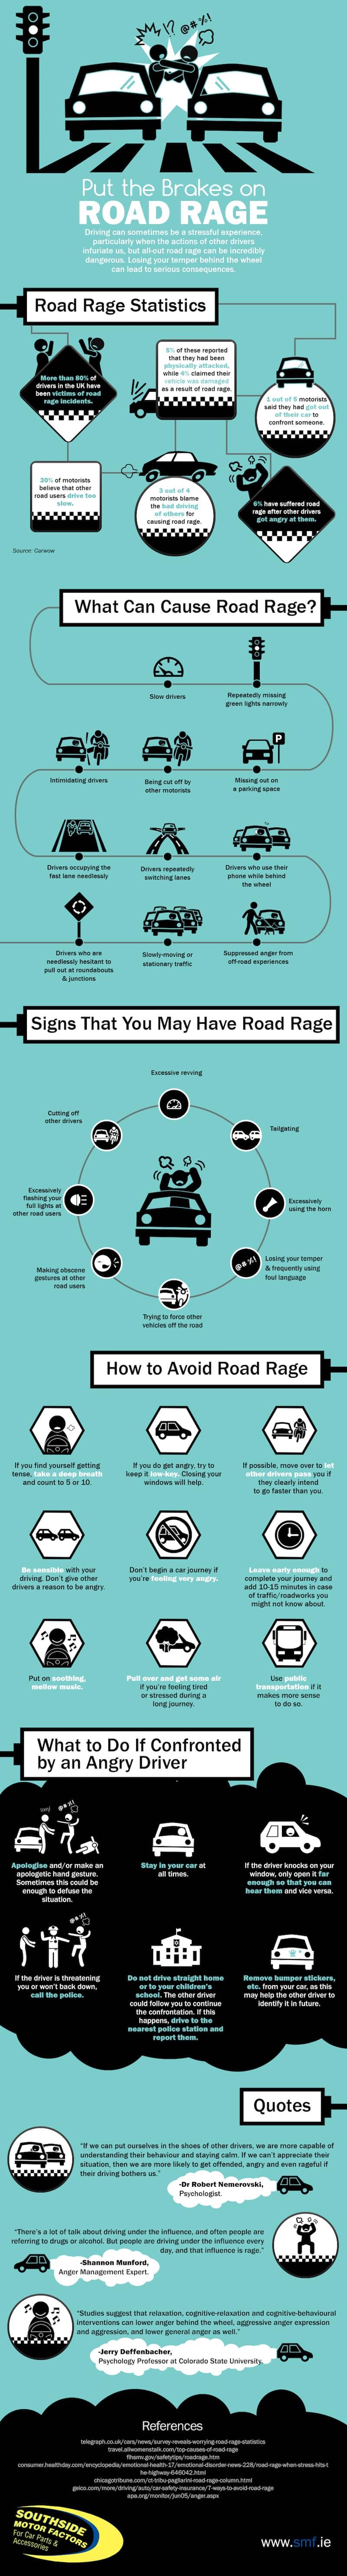 Road rage infographic